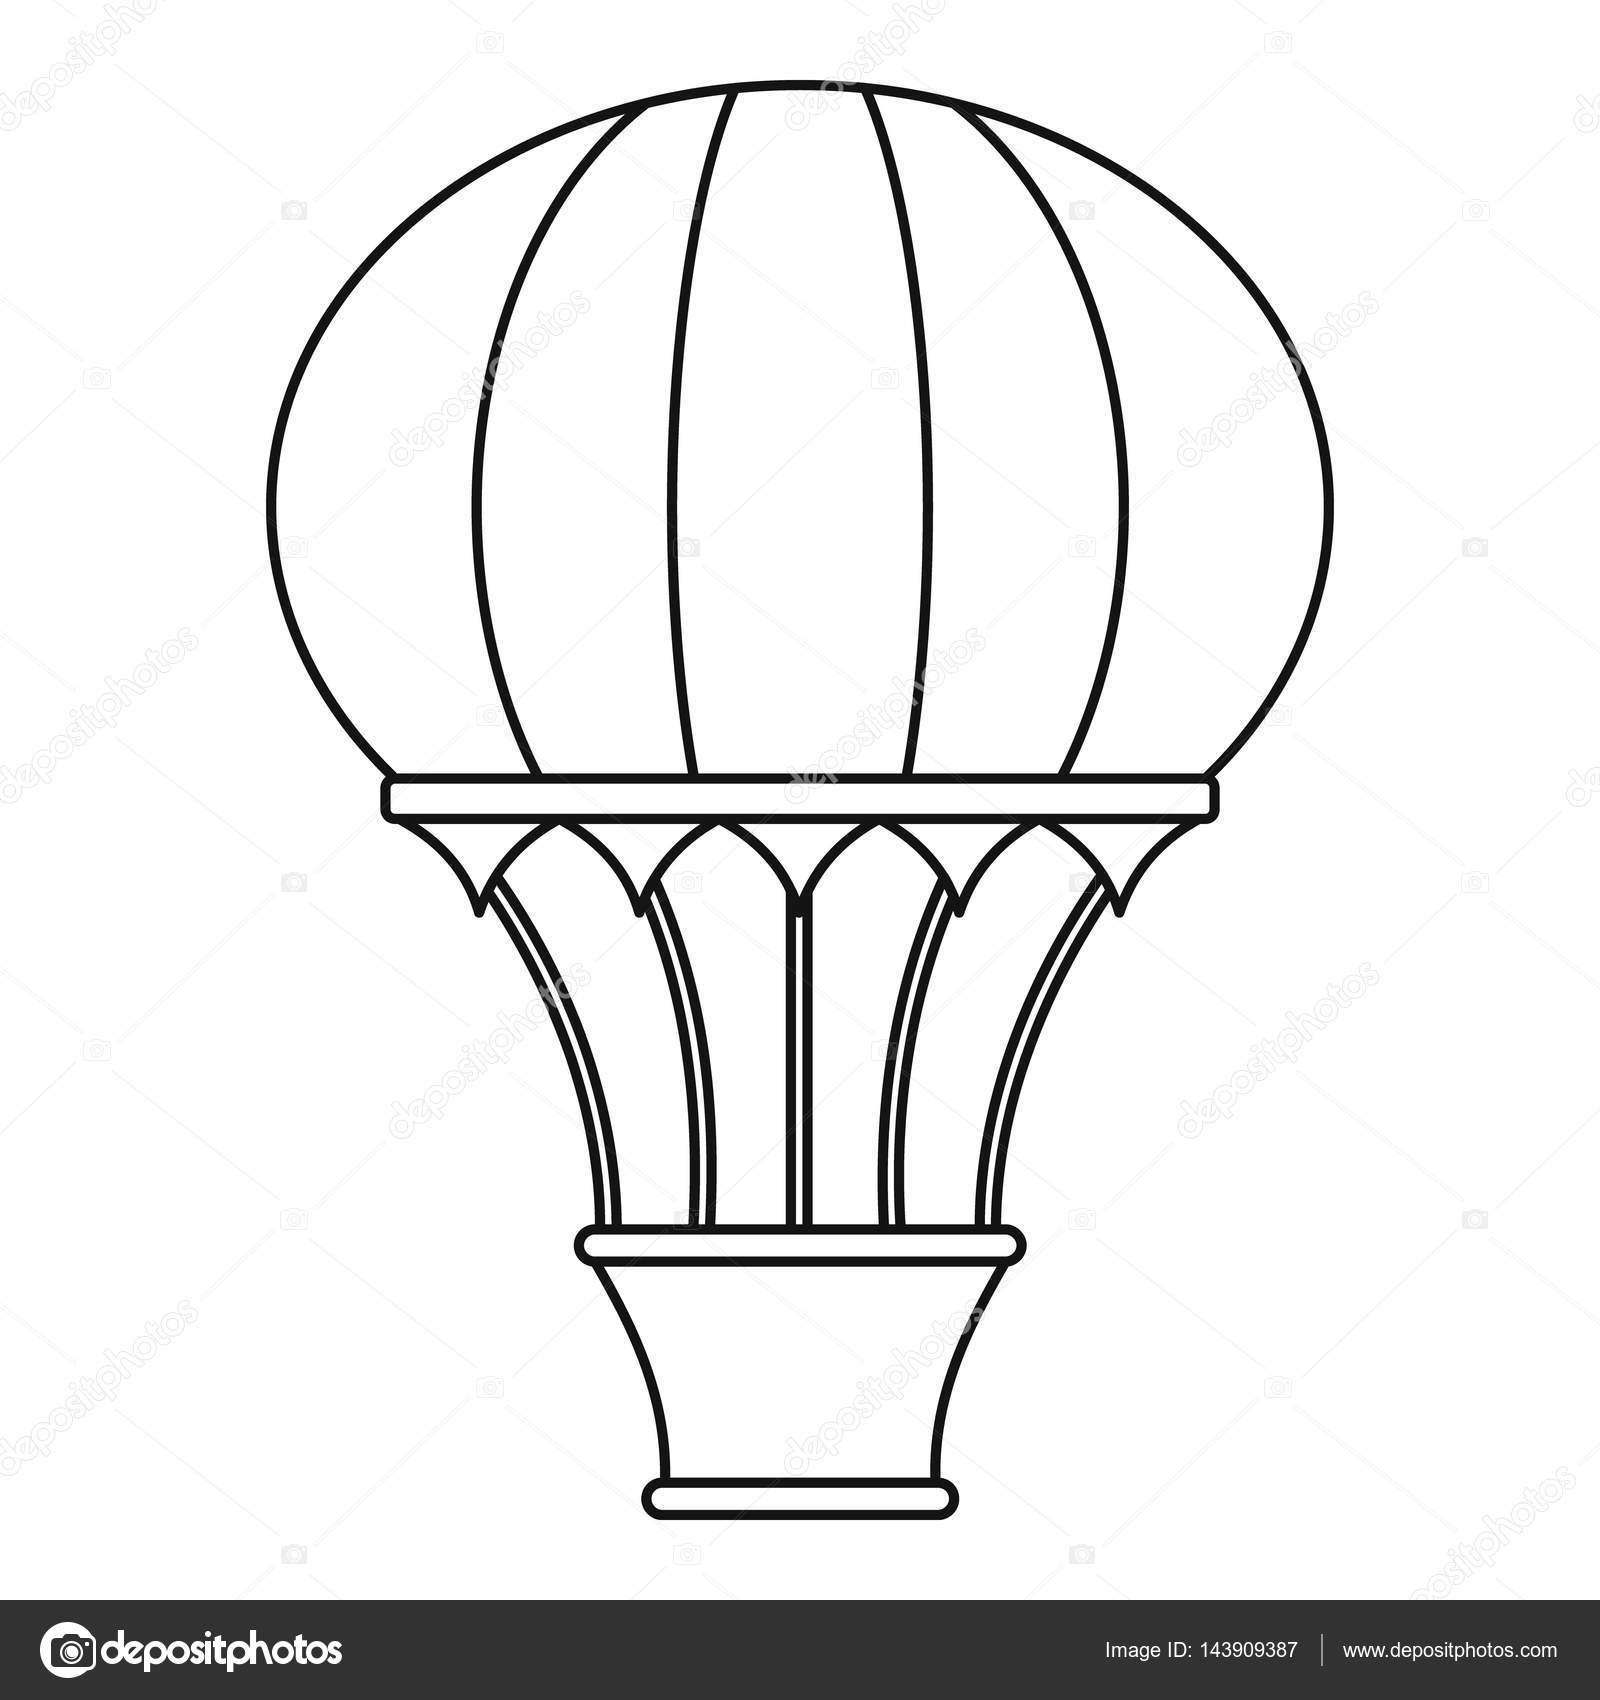 Stock Illustration Hot Air Balloon With Basket also Nevis Torrent Carp Feeder 390h Ajandek I24366 additionally 8 in addition Misturador De Lavatorio Mesa 1872 C80 in addition 137692427945. on 14390